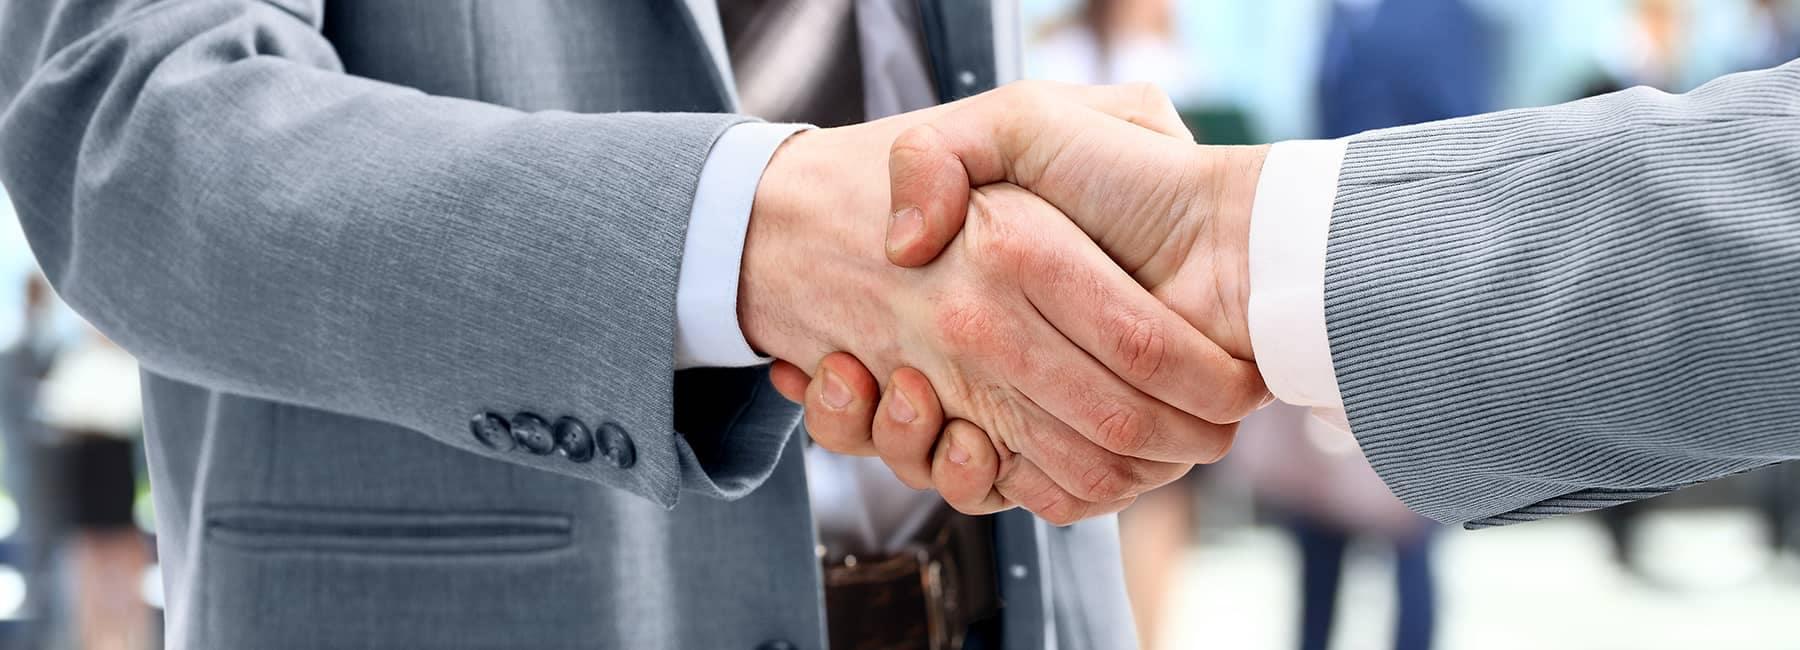 customer and dealer shaking hands